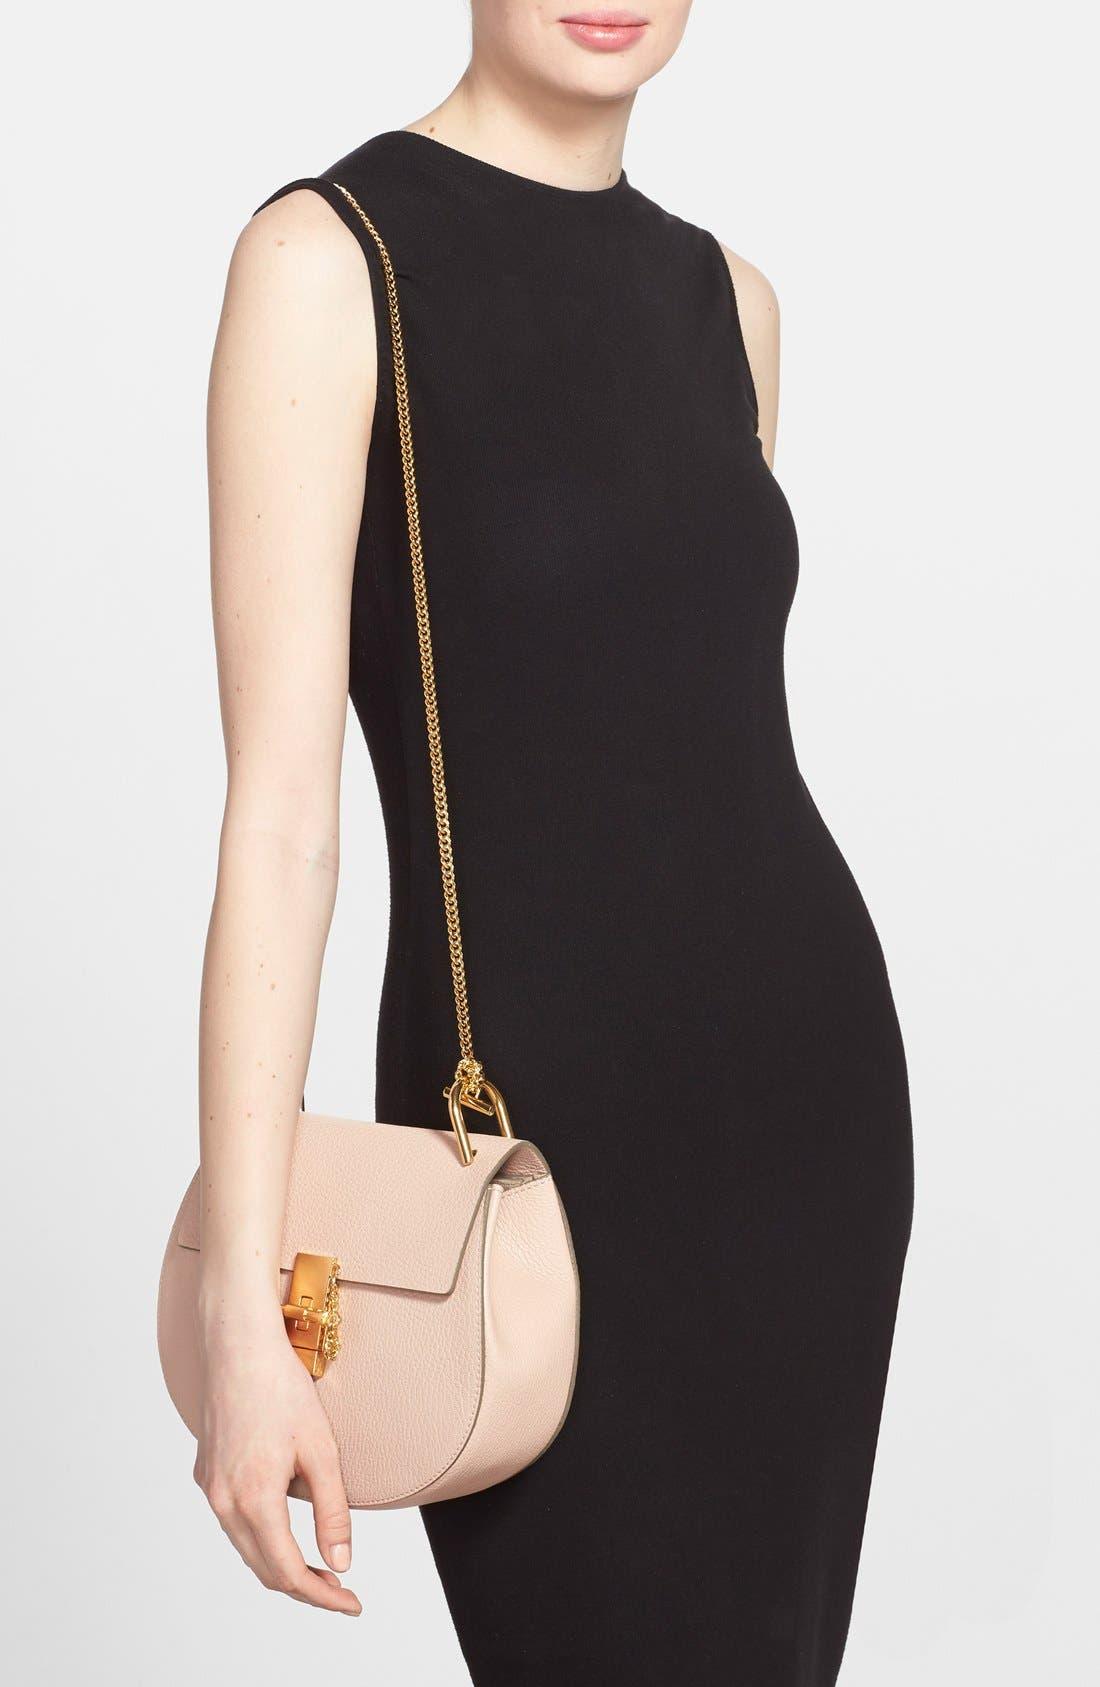 CHLOÉ, Drew Leather Shoulder Bag, Alternate thumbnail 3, color, 650